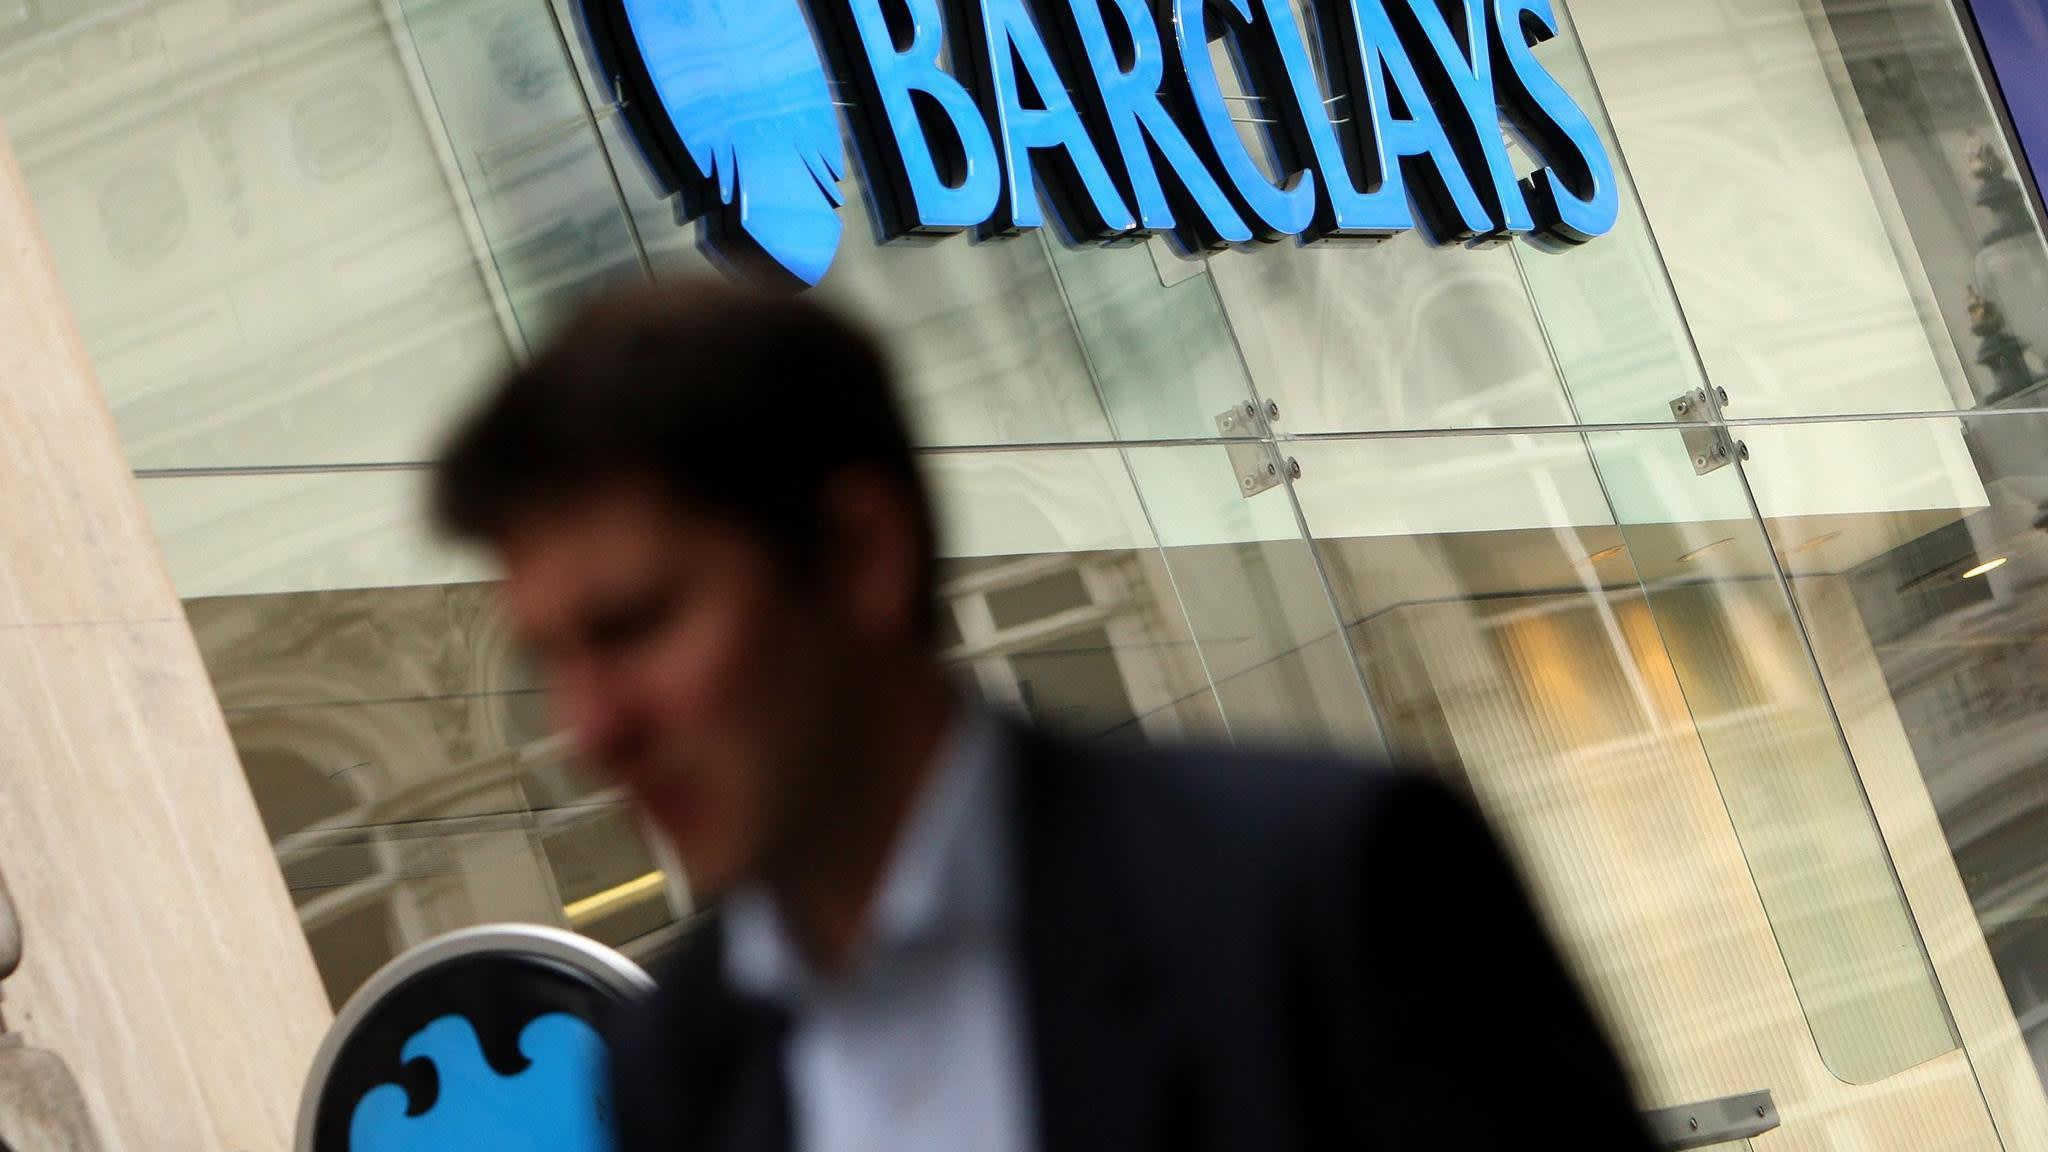 Barclays chairman Sir David Walker defends bonus rise | Financial Times